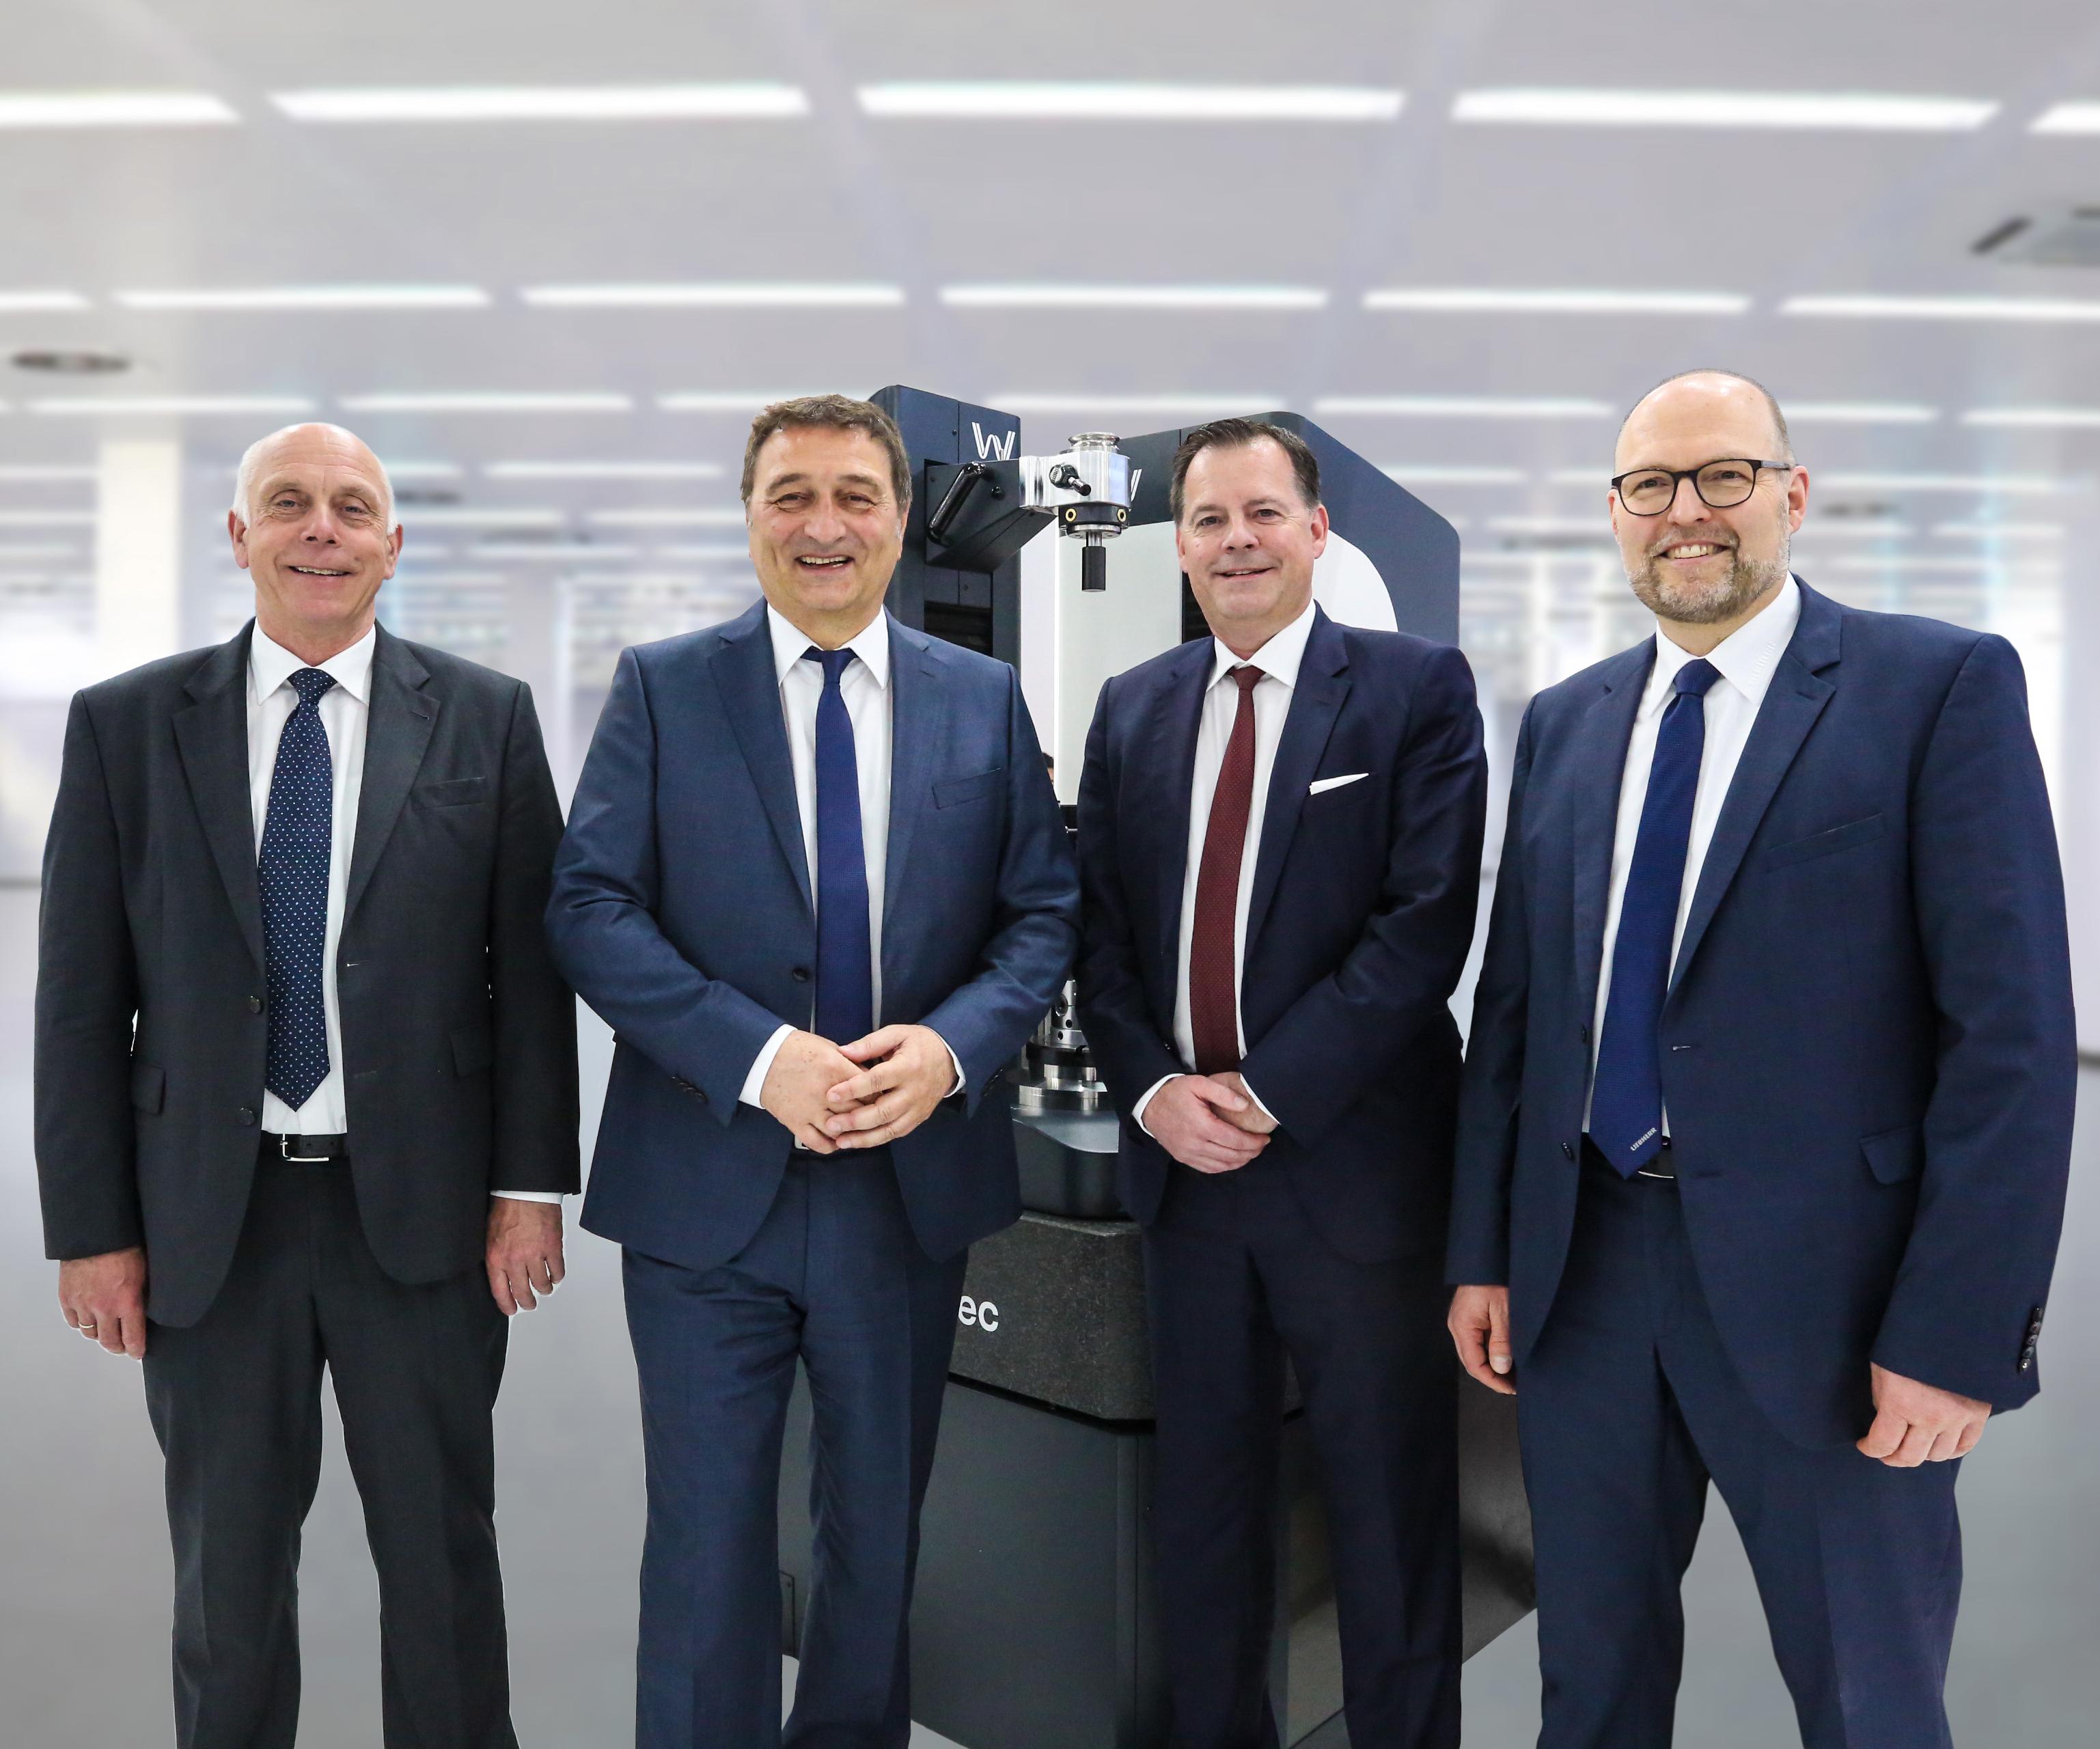 Left to right: Mr. Heinrich Bruederle (Wenzel GearTec), Dr. Christian Lang (Liebherr-Verzahntechnik GmbH), Frank Wenzel (Wenzel GearTec), Dr. Hans Gronbach (Liebherr-Verzahntechnik GmbH)